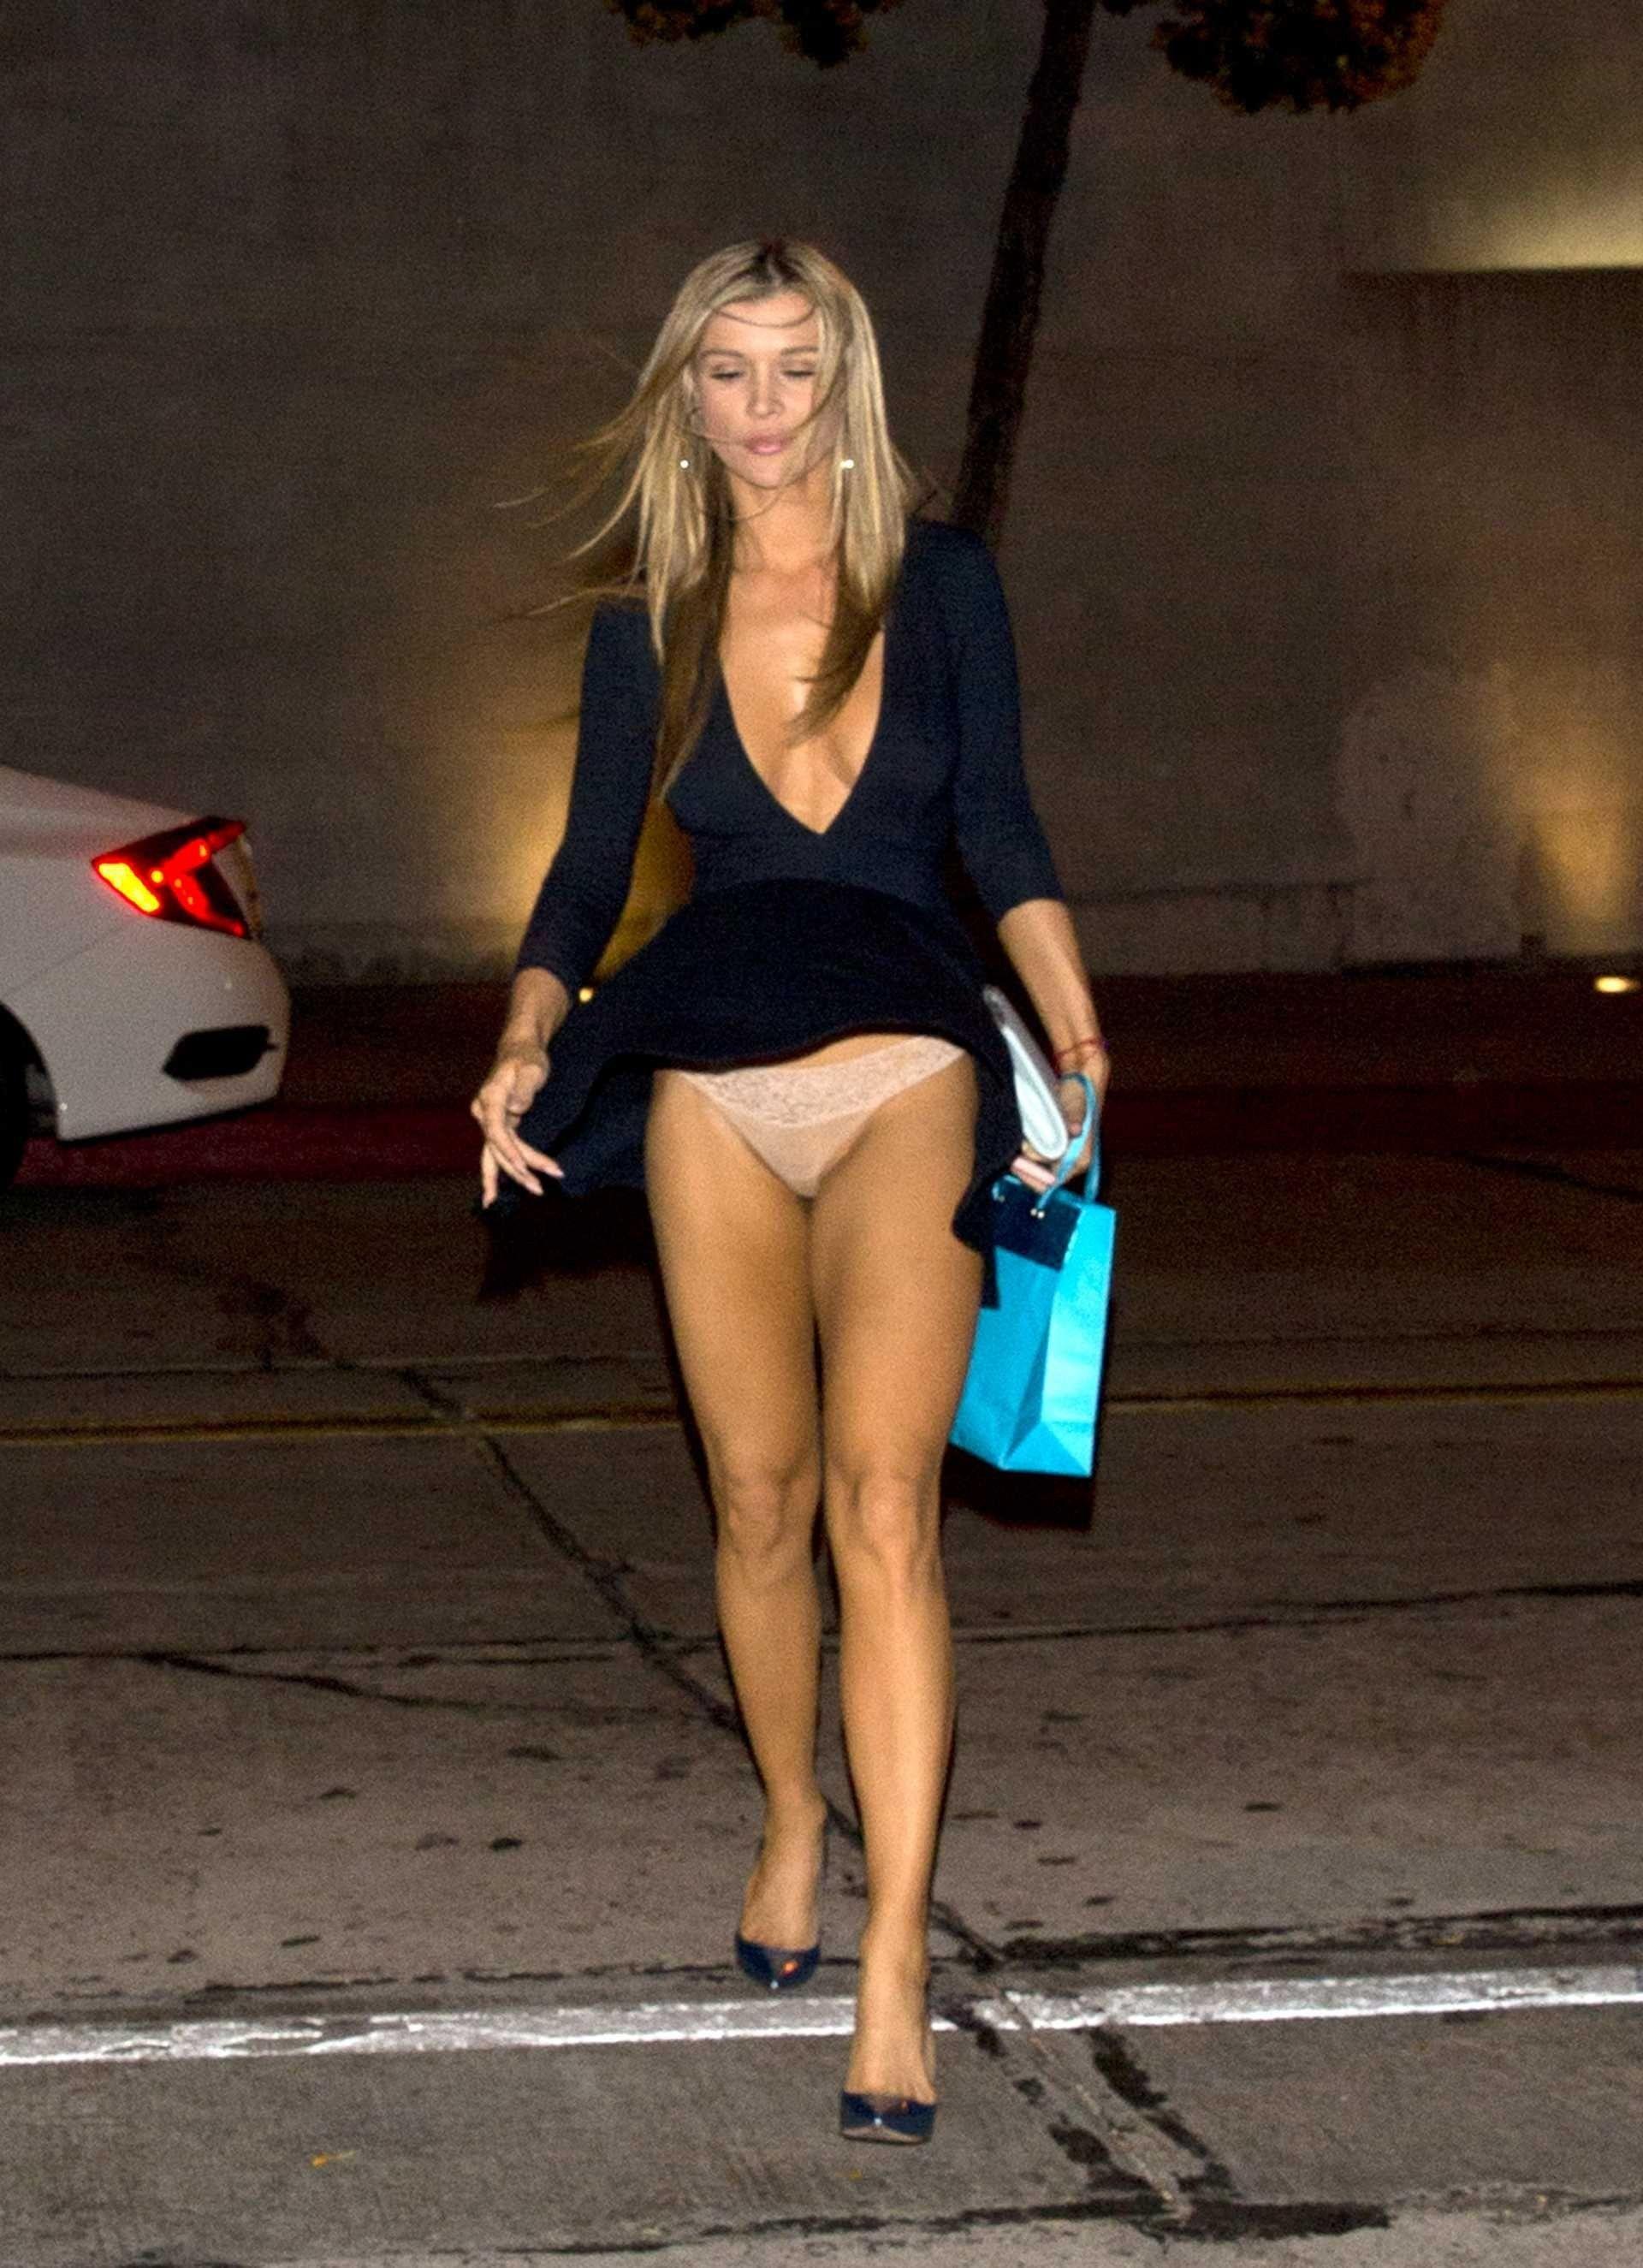 Celebrites Joanna Krupa naked (54 photo), Topless, Paparazzi, Boobs, panties 2015